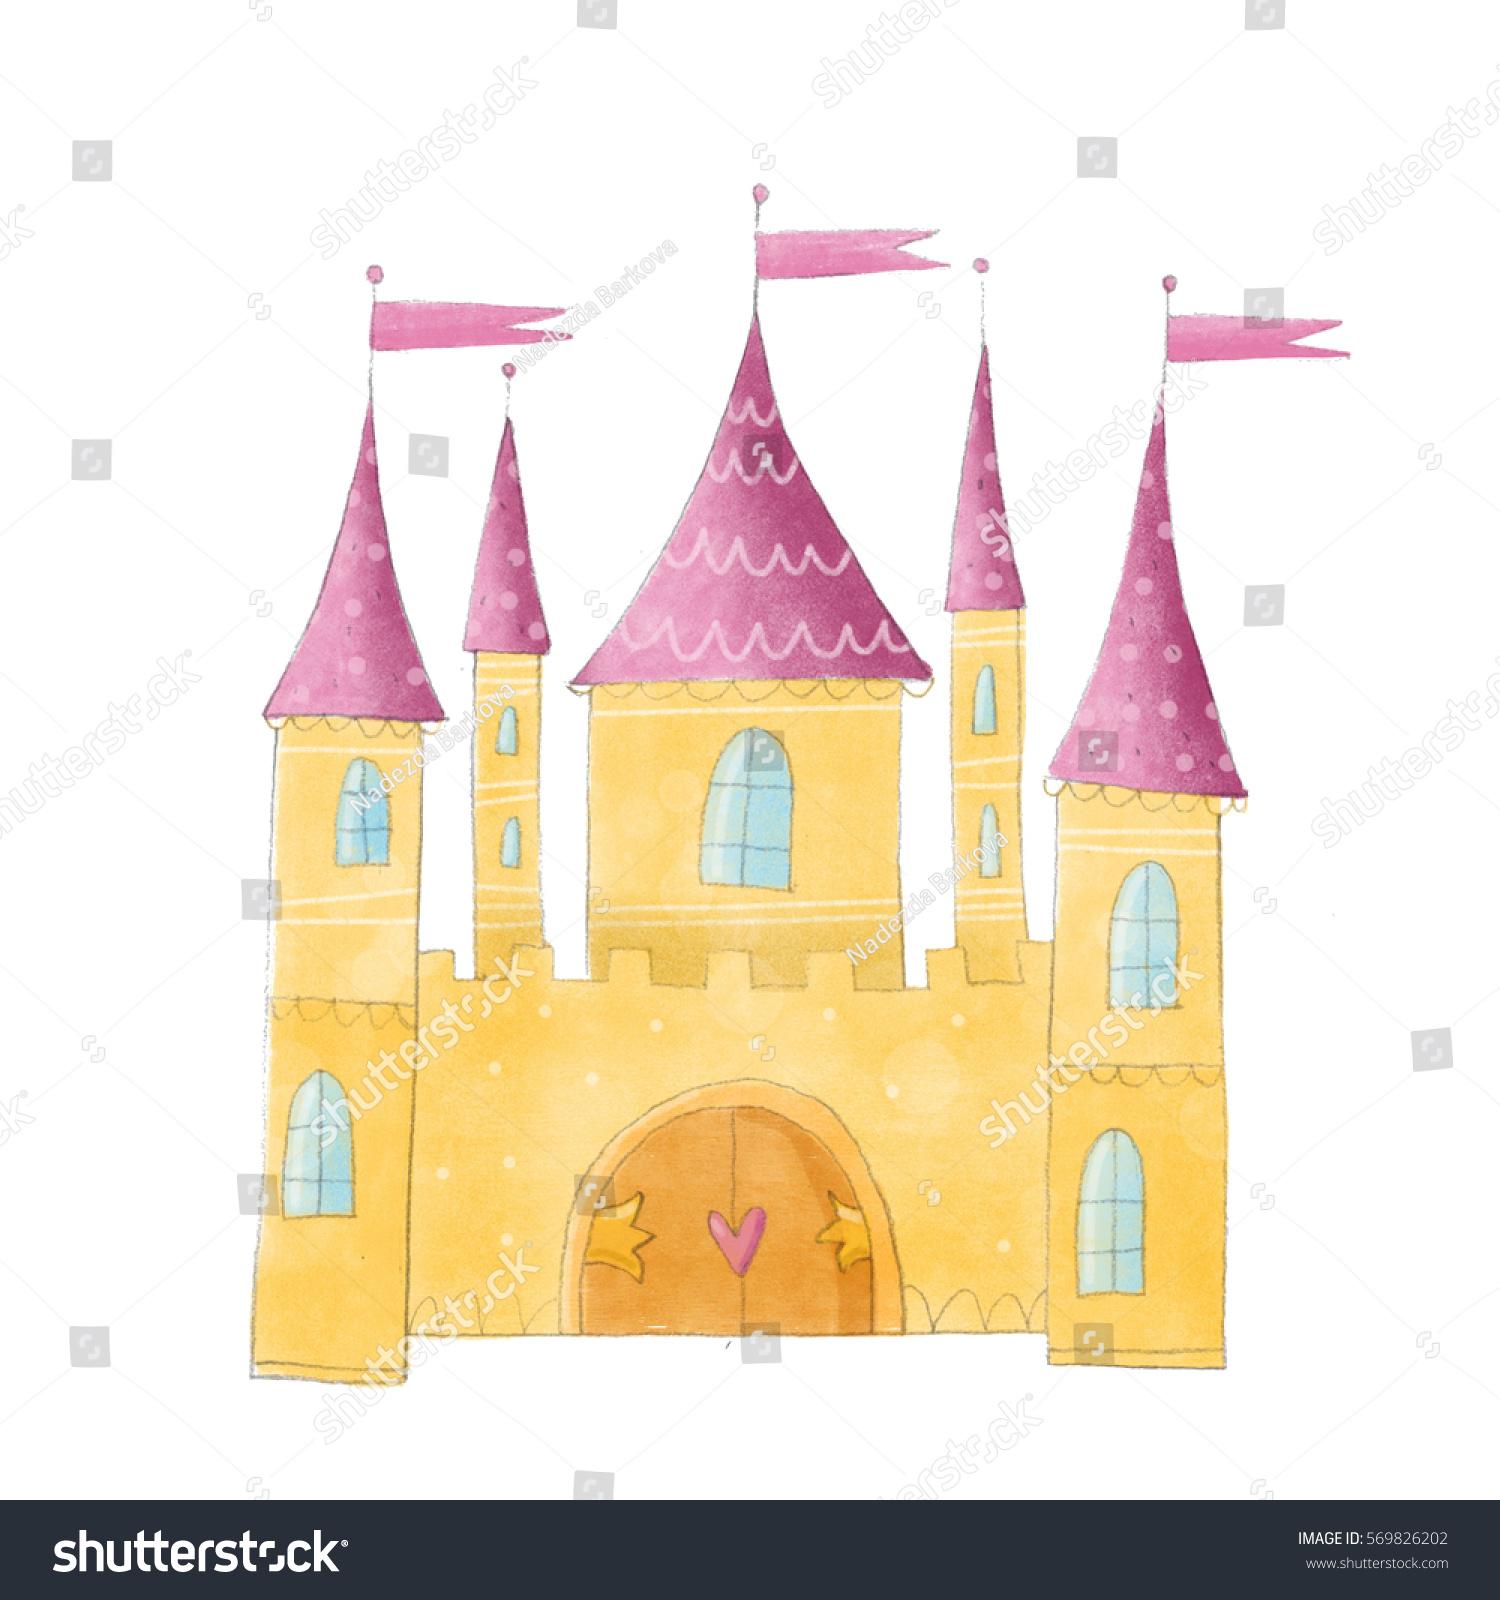 castle cute illustration stock illustration 569826202 - shutterstock